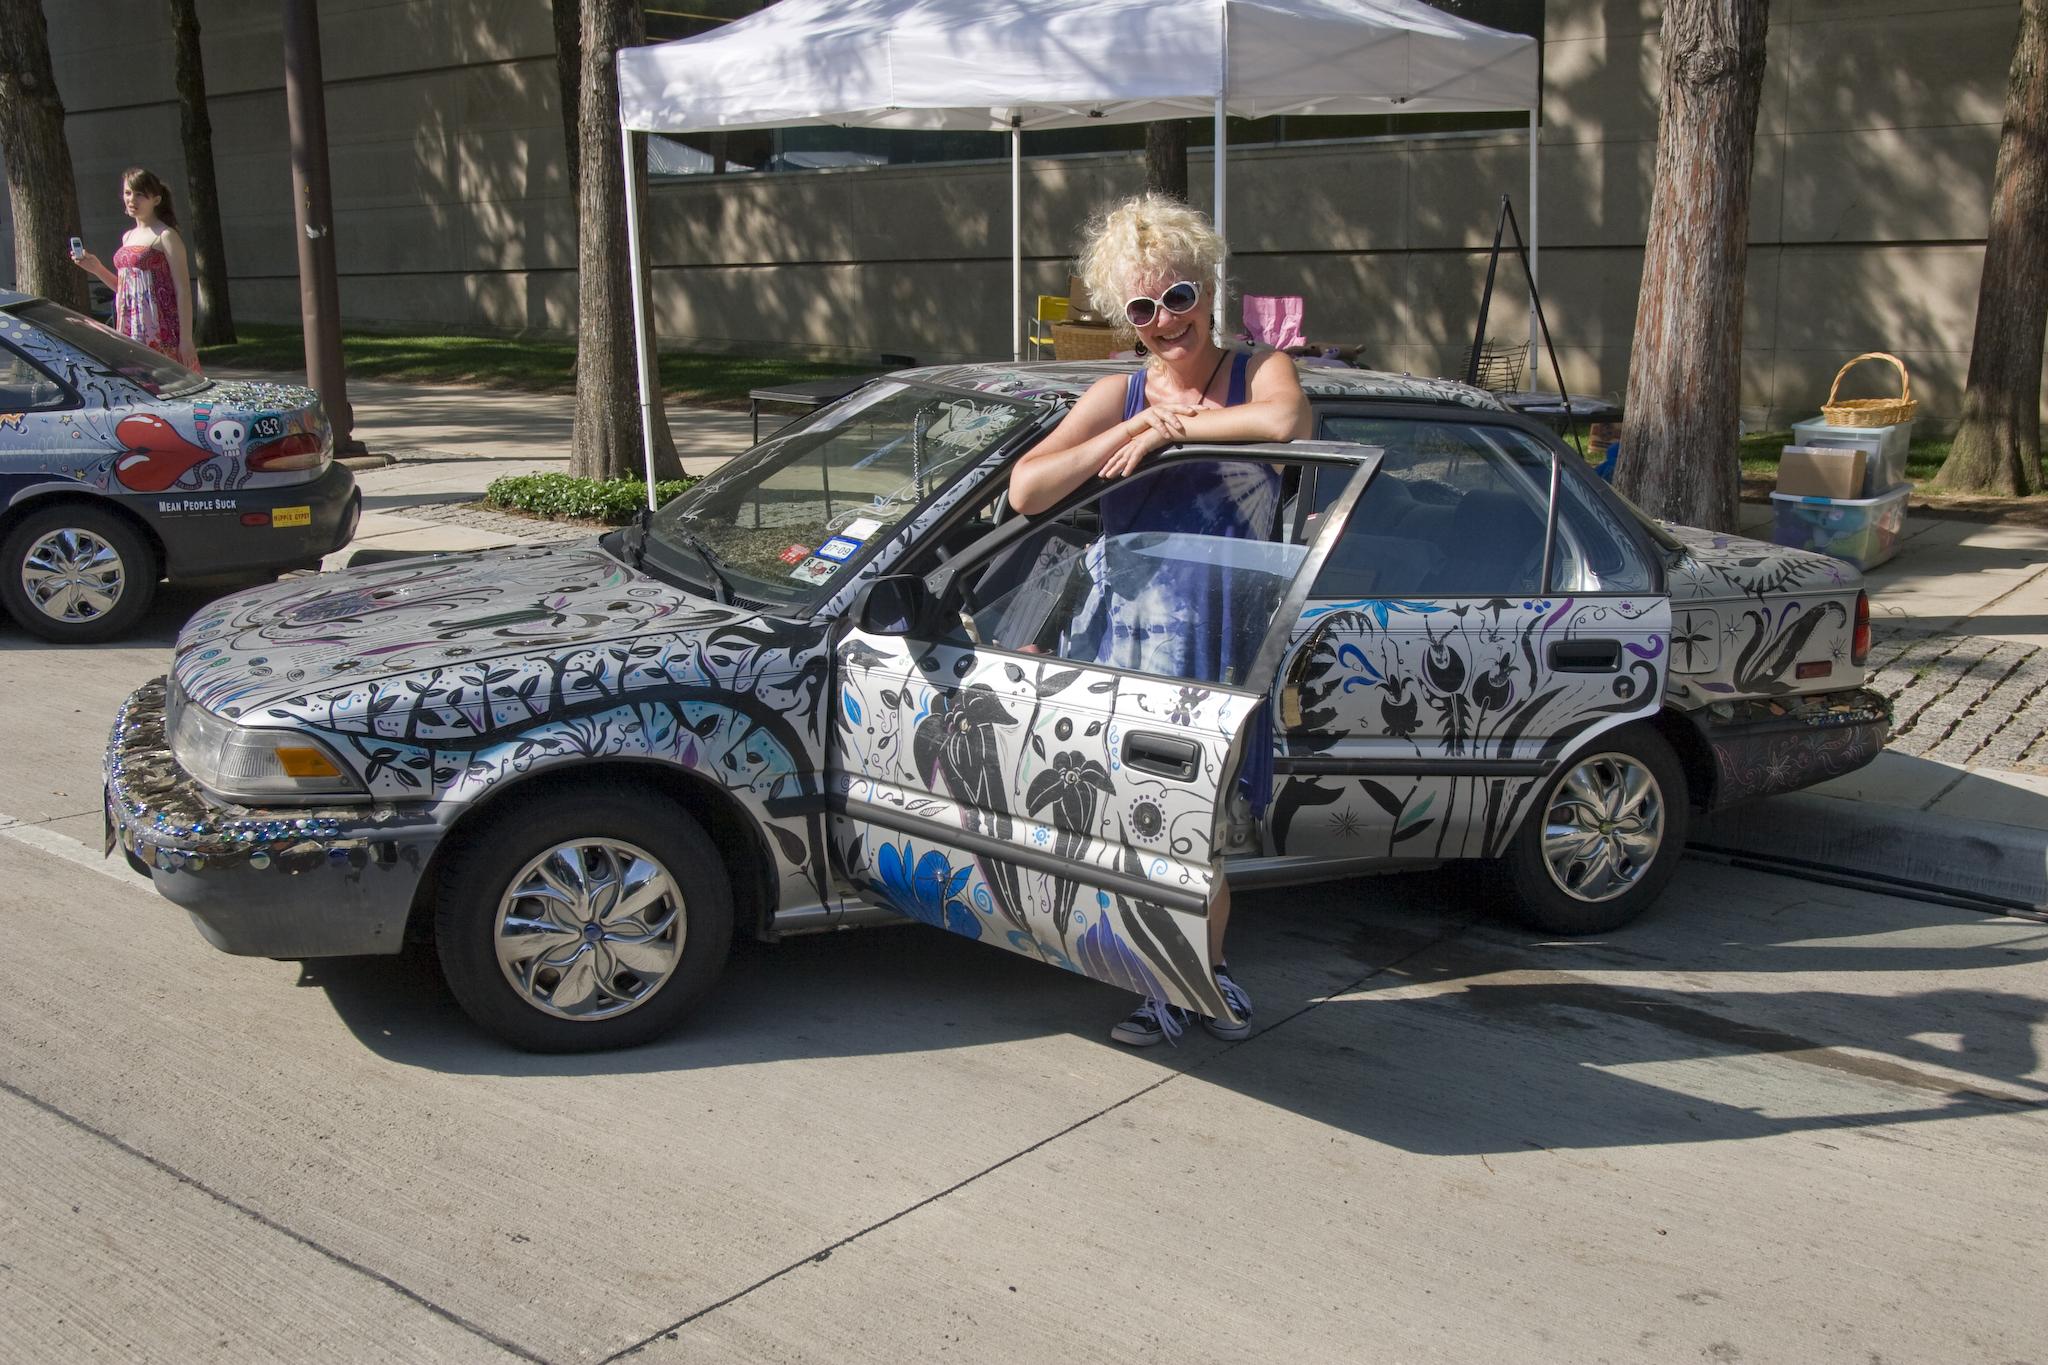 me & art car, side view - Dallas City Arts 6:09.jpg